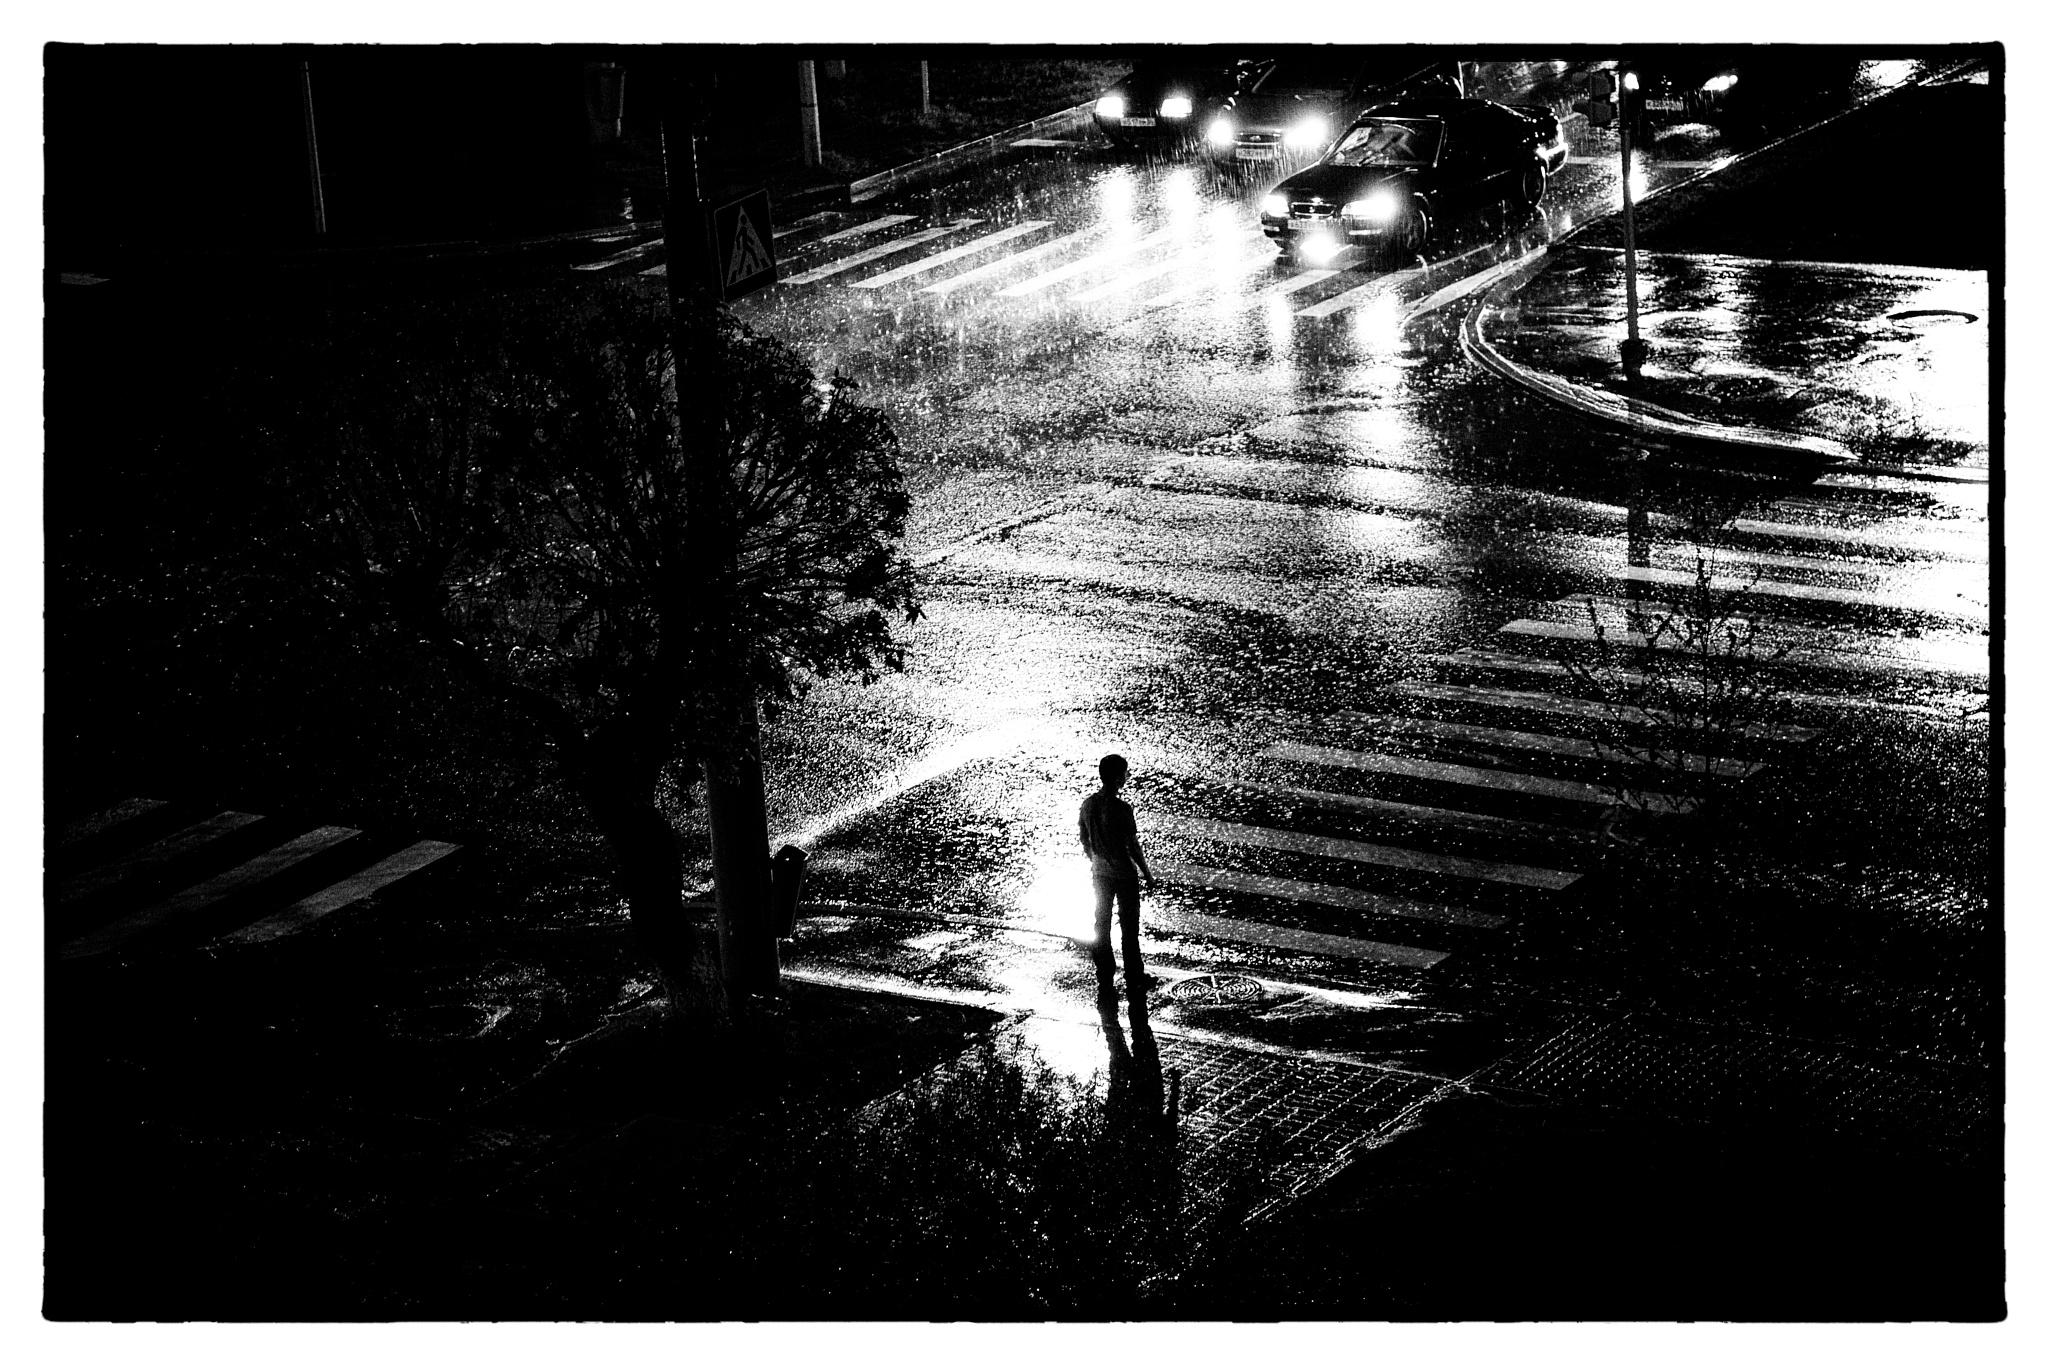 Untitled by Sergey Kiselev